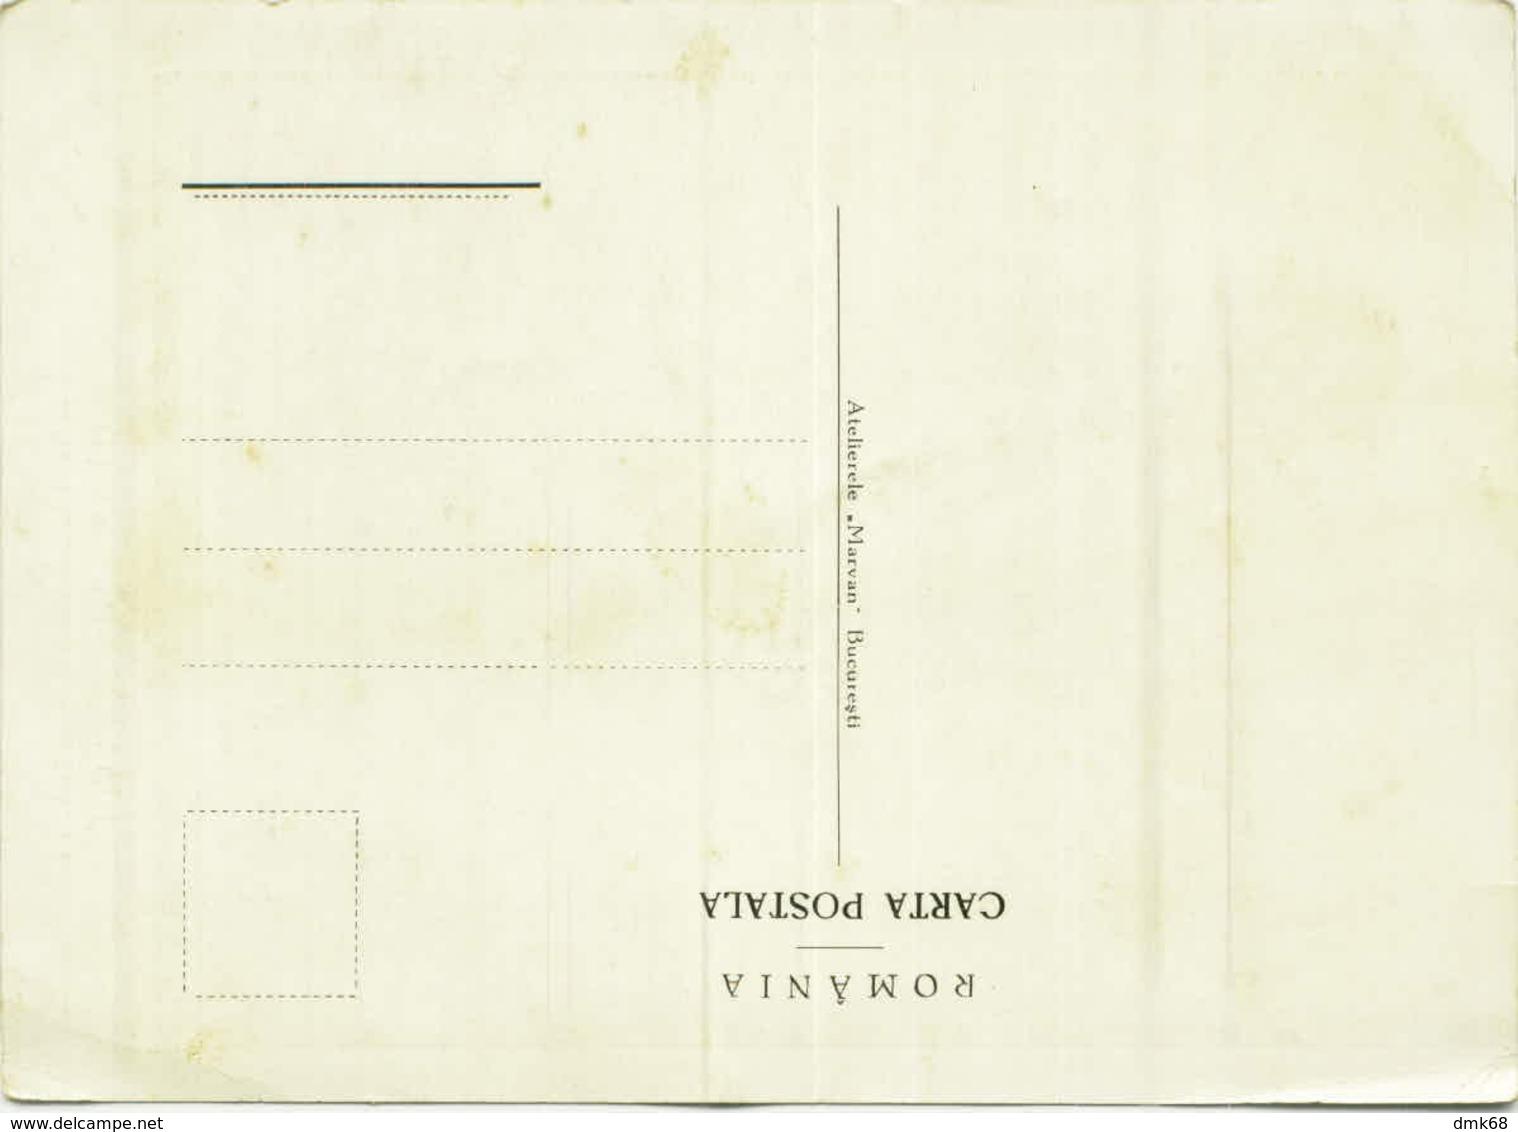 ROMANIA - BUCAREST - HOTEL SPLENDID - EDIT ATELIER MARVAN - 1940s/50s (BG5137) - Romania